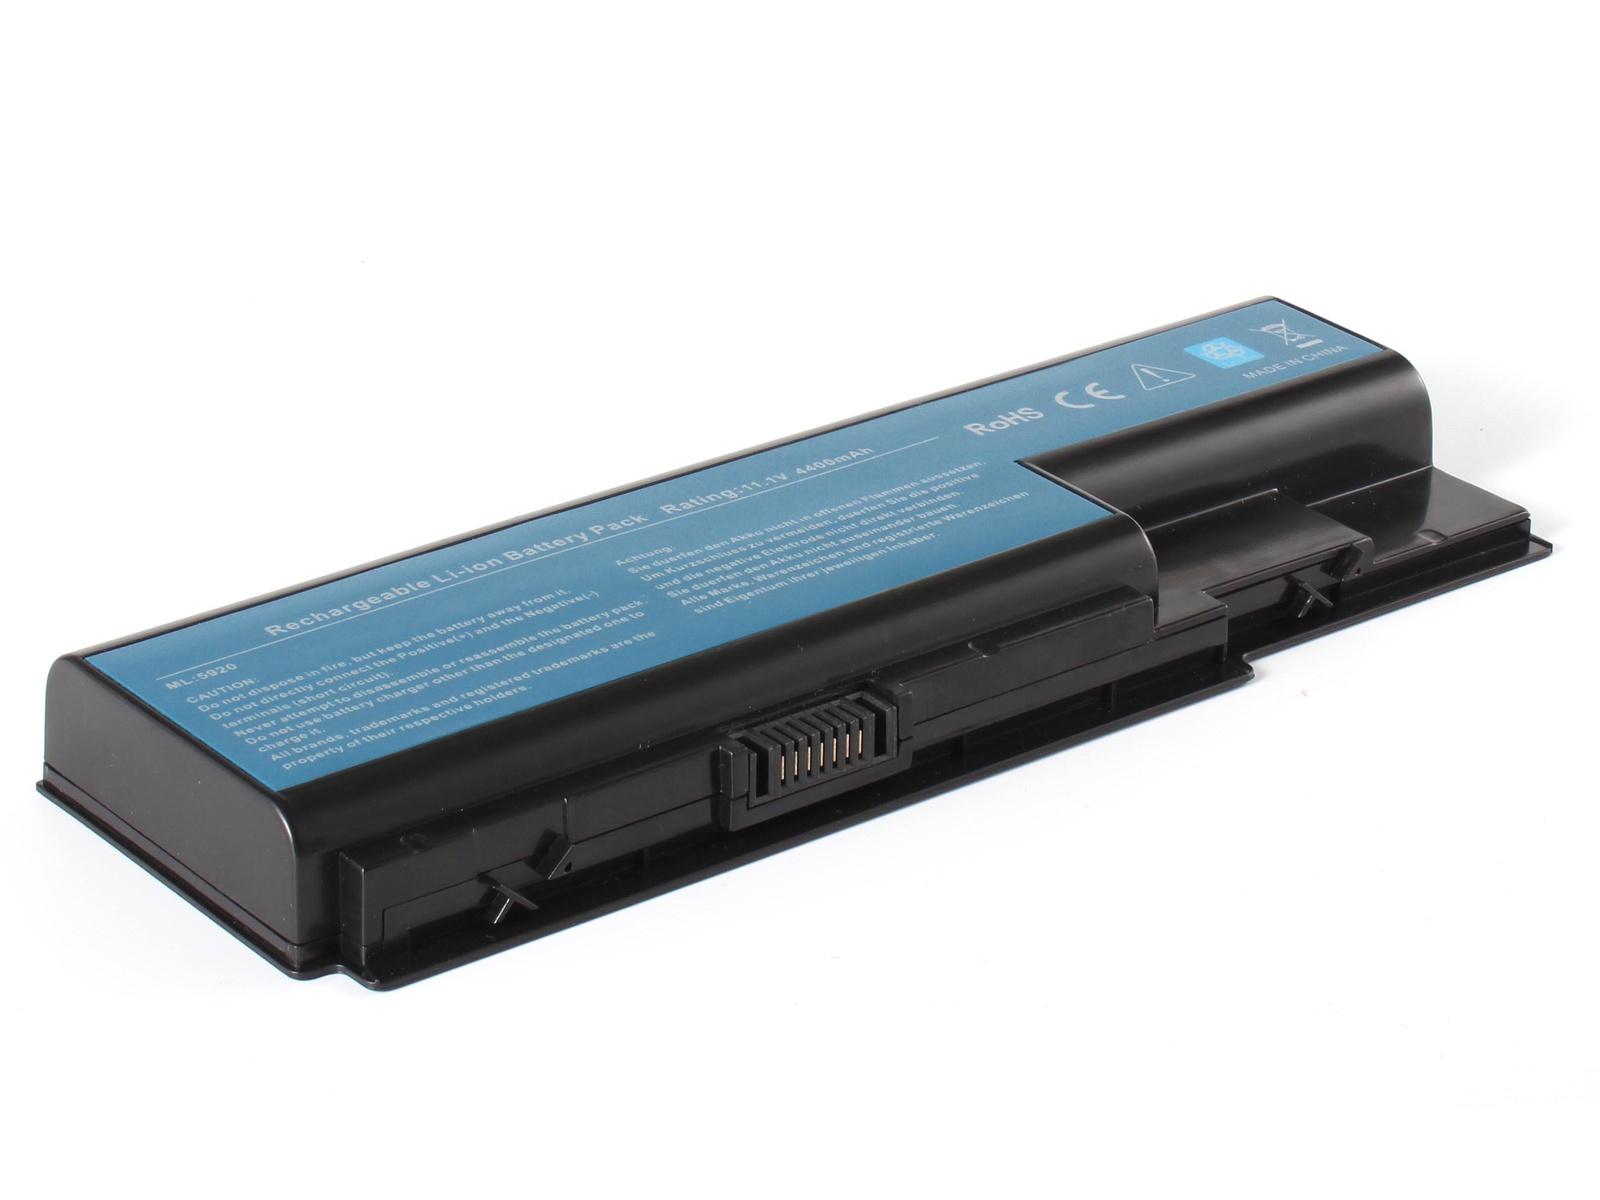 Аккумулятор для ноутбука AnyBatt для Acer Aspire 7738g-754G50Mi, Aspire 8935G-664G32Mi, Aspire 8942G-724G64Bi, Aspire 5315-201G12Mi, Aspire 5739G-733G32Mi, Aspire 5739g-754G50Mi, Aspire 5910G, Aspire 5935G-754G50Mi ноутбук acer aspire 8942g